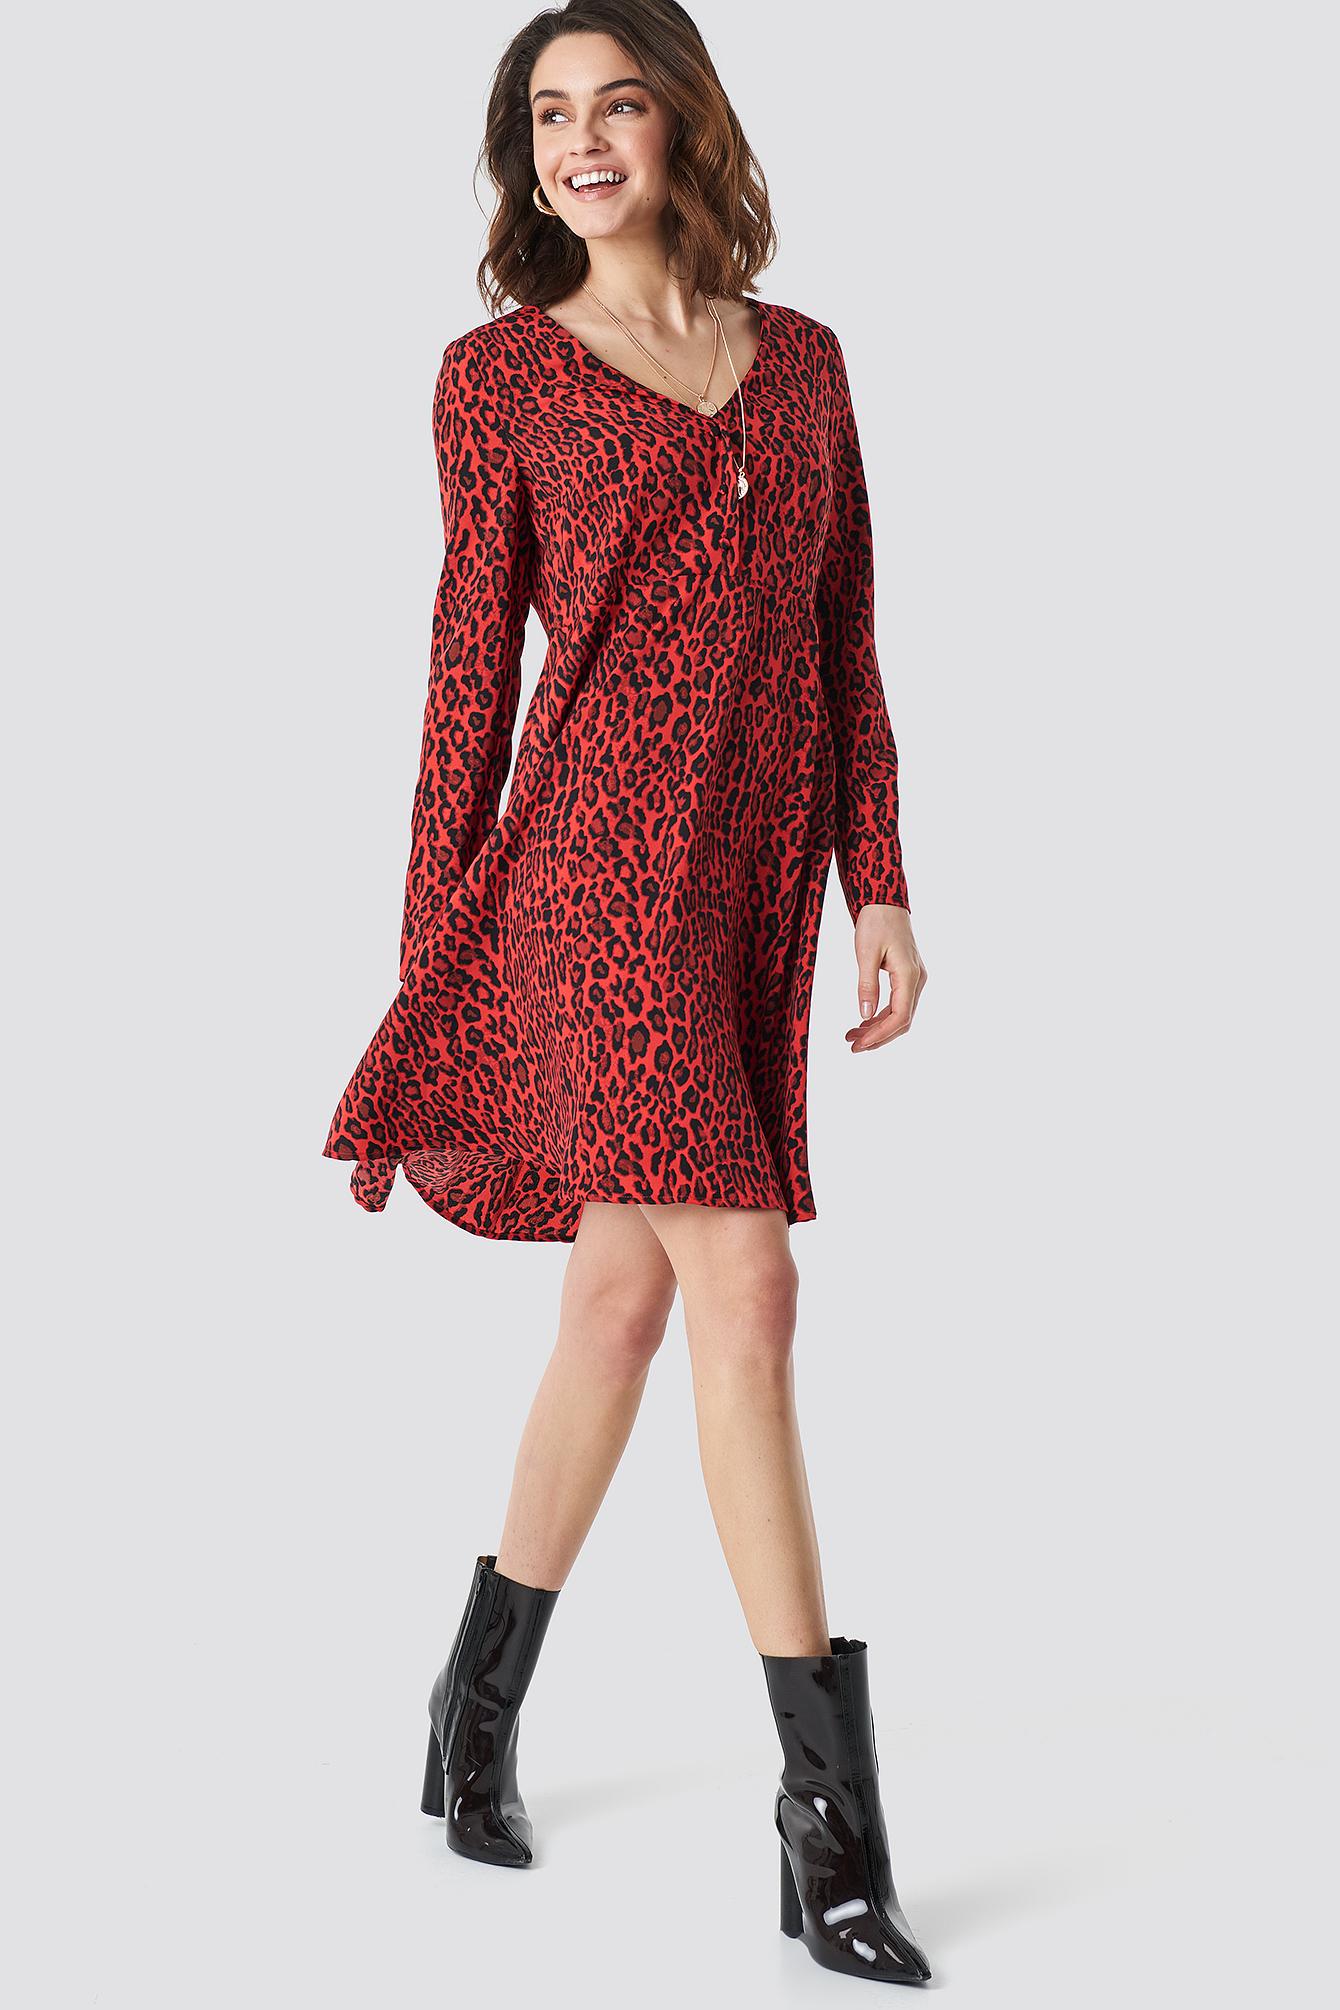 na-kd -  Leopard Print Button Up Ls Dress - Red